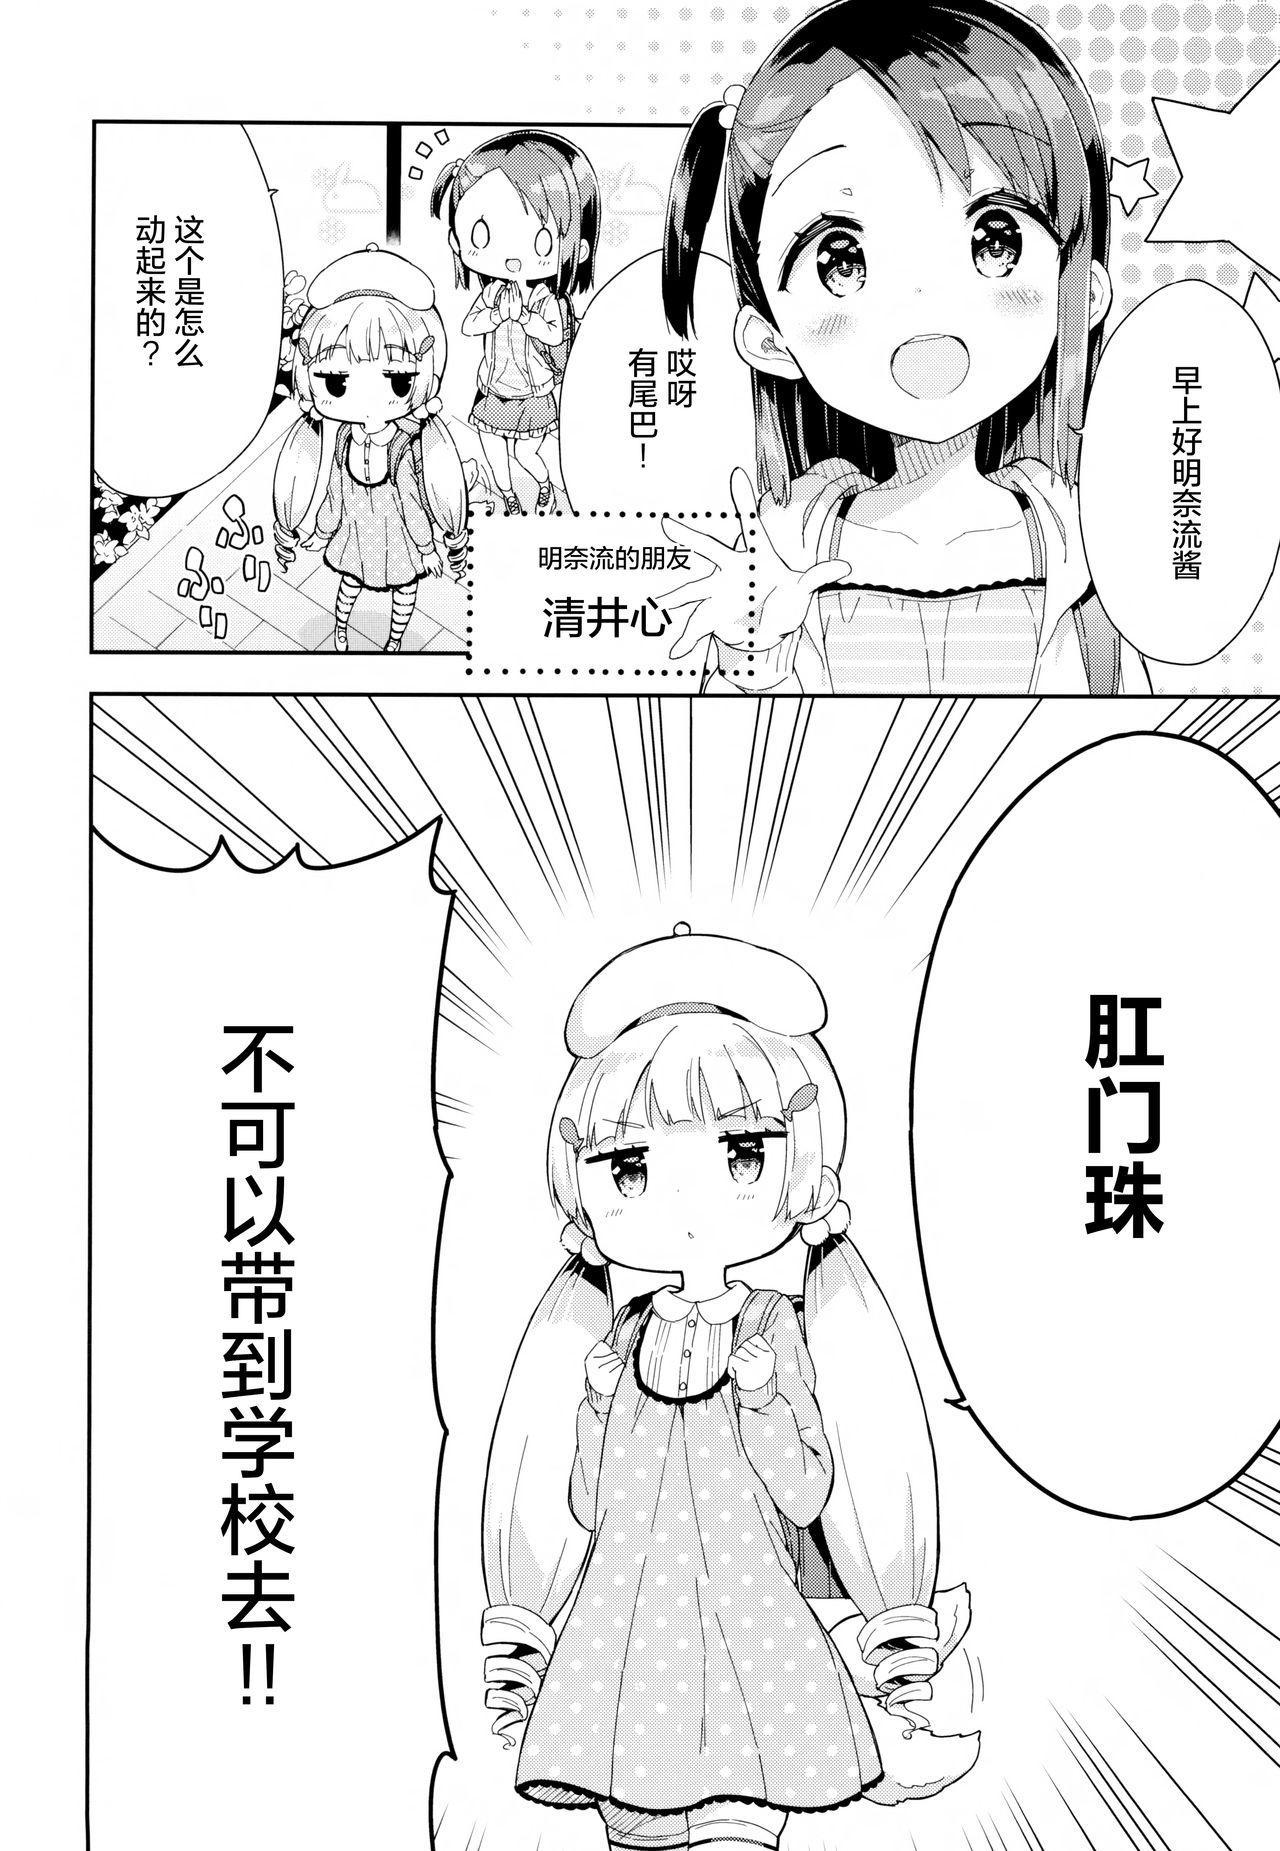 (C95) [Gyuunyuuya-san (Gyuunyuu Nomio)] Yumemiru Anaru-chan - Dreaming Girl ANARU [Chinese] [绅士仓库汉化] 6